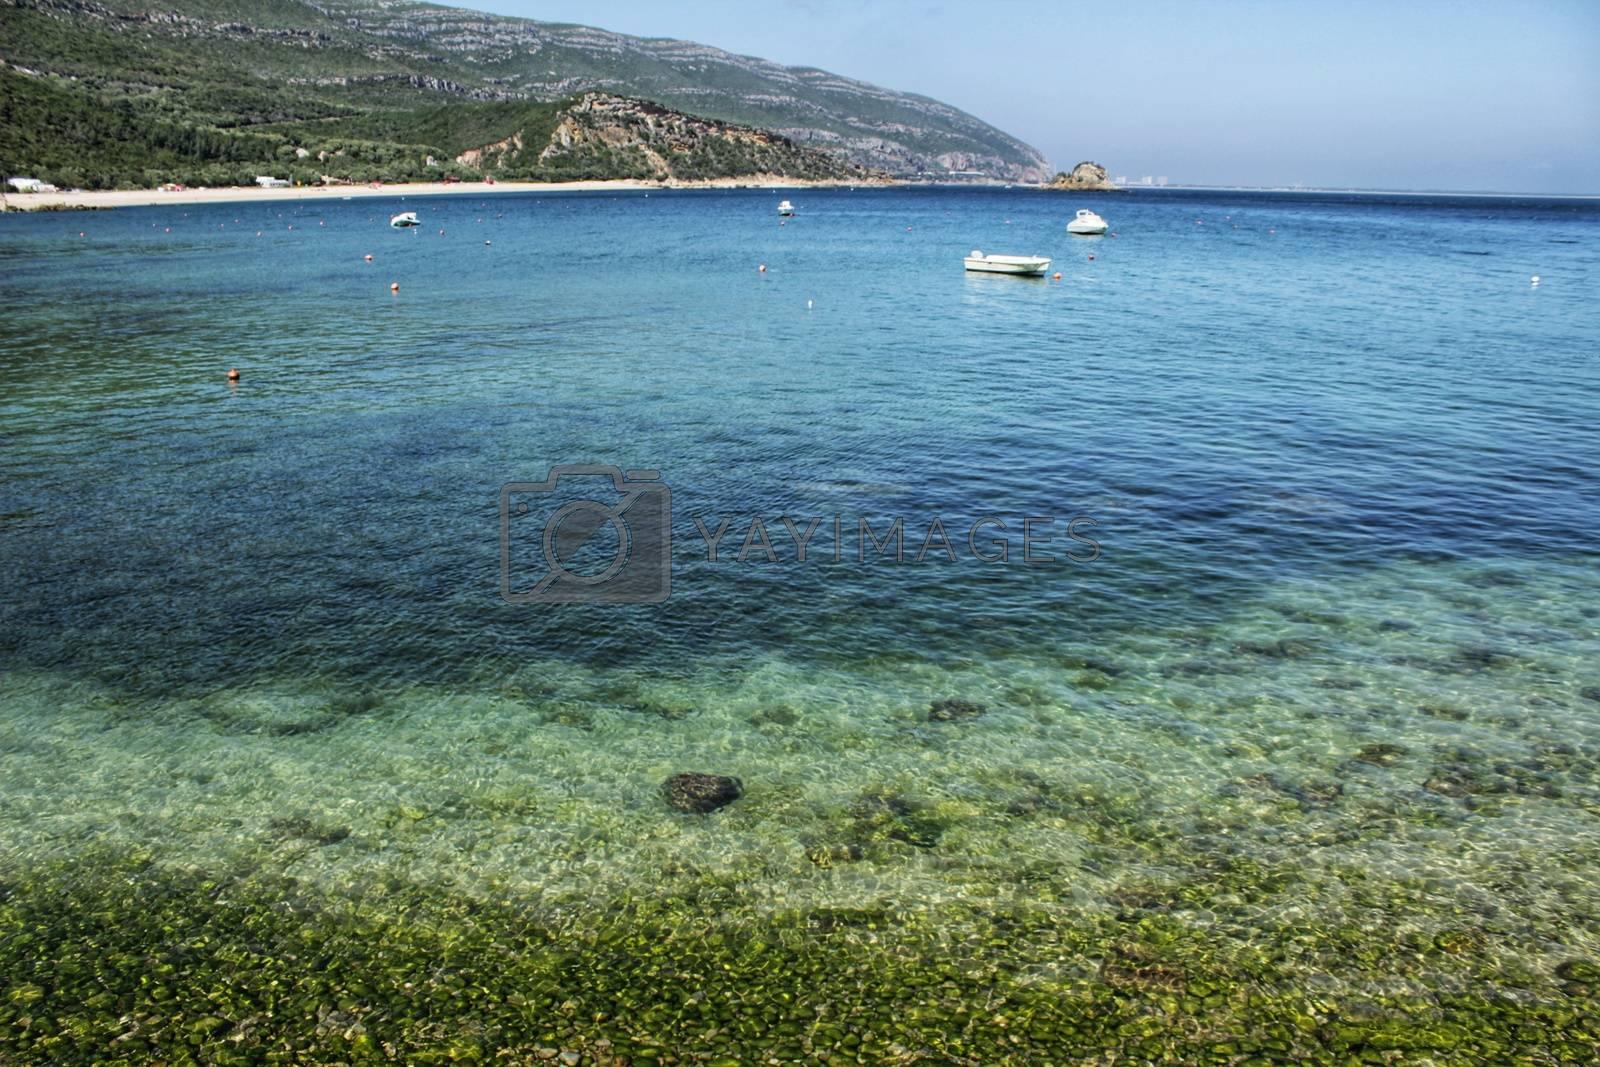 Crystalline waters of Portinho Beach between mountains in Portugal